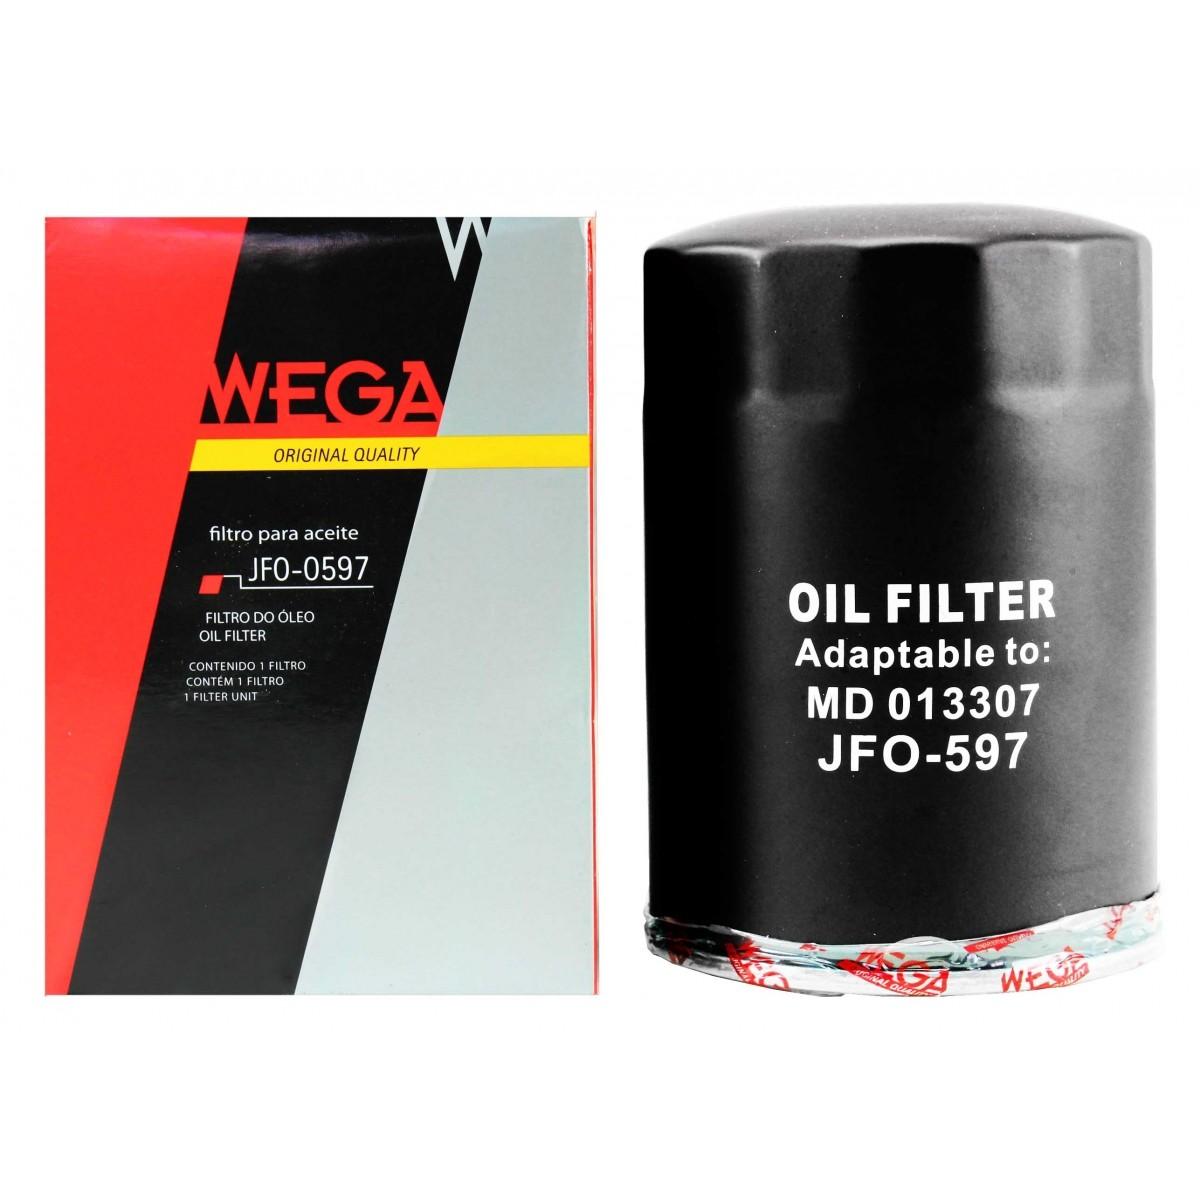 Filtro de oleo Wega JFO0597 / Tecfil PSL158 em até 6x sem juros